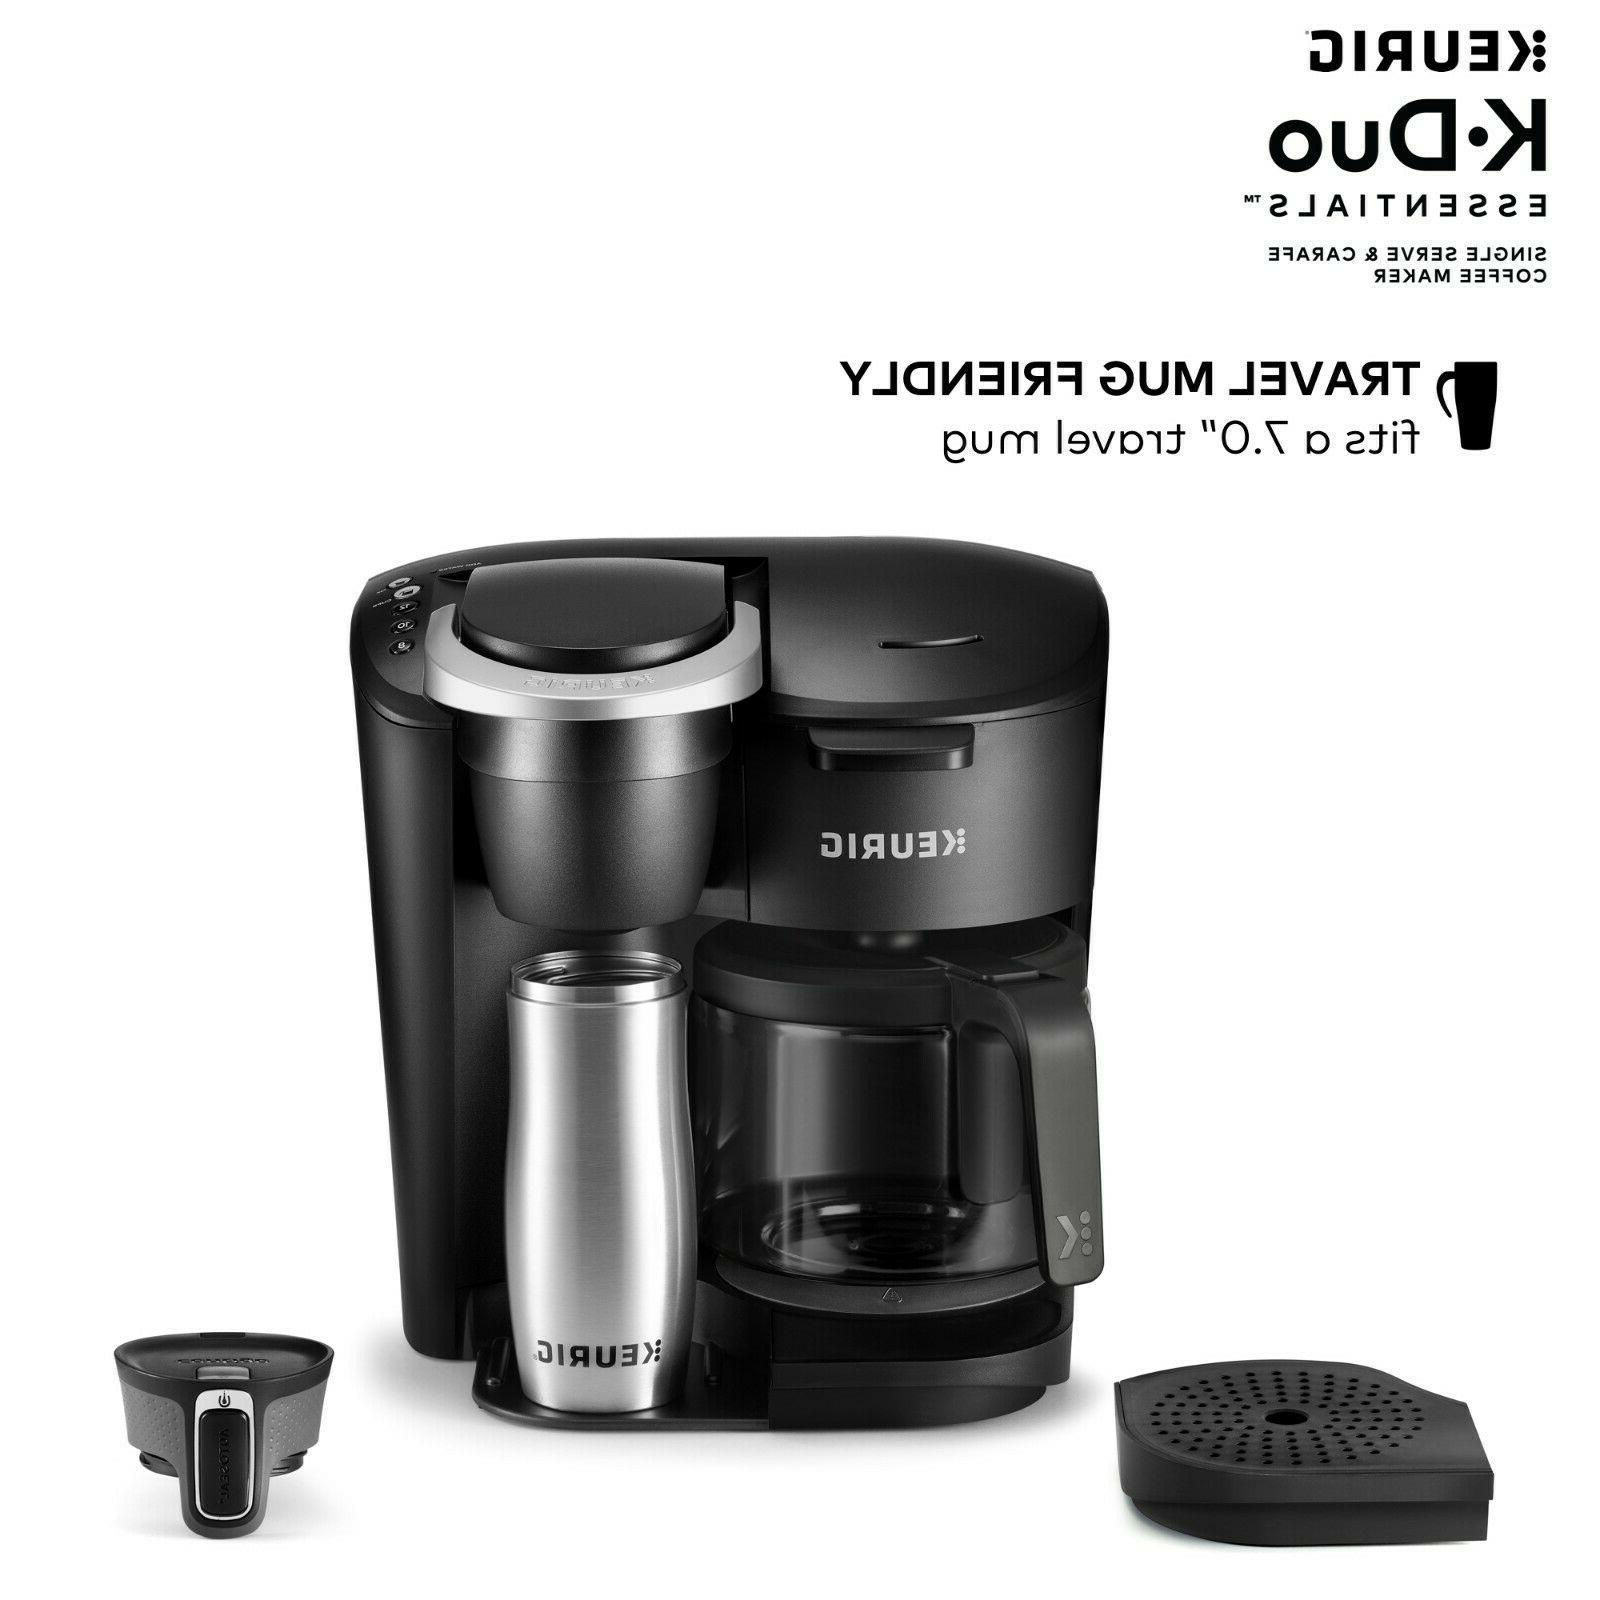 Keurig K-Duo Essentials Coffee Maker, 12 Cup Carafe Brewer,